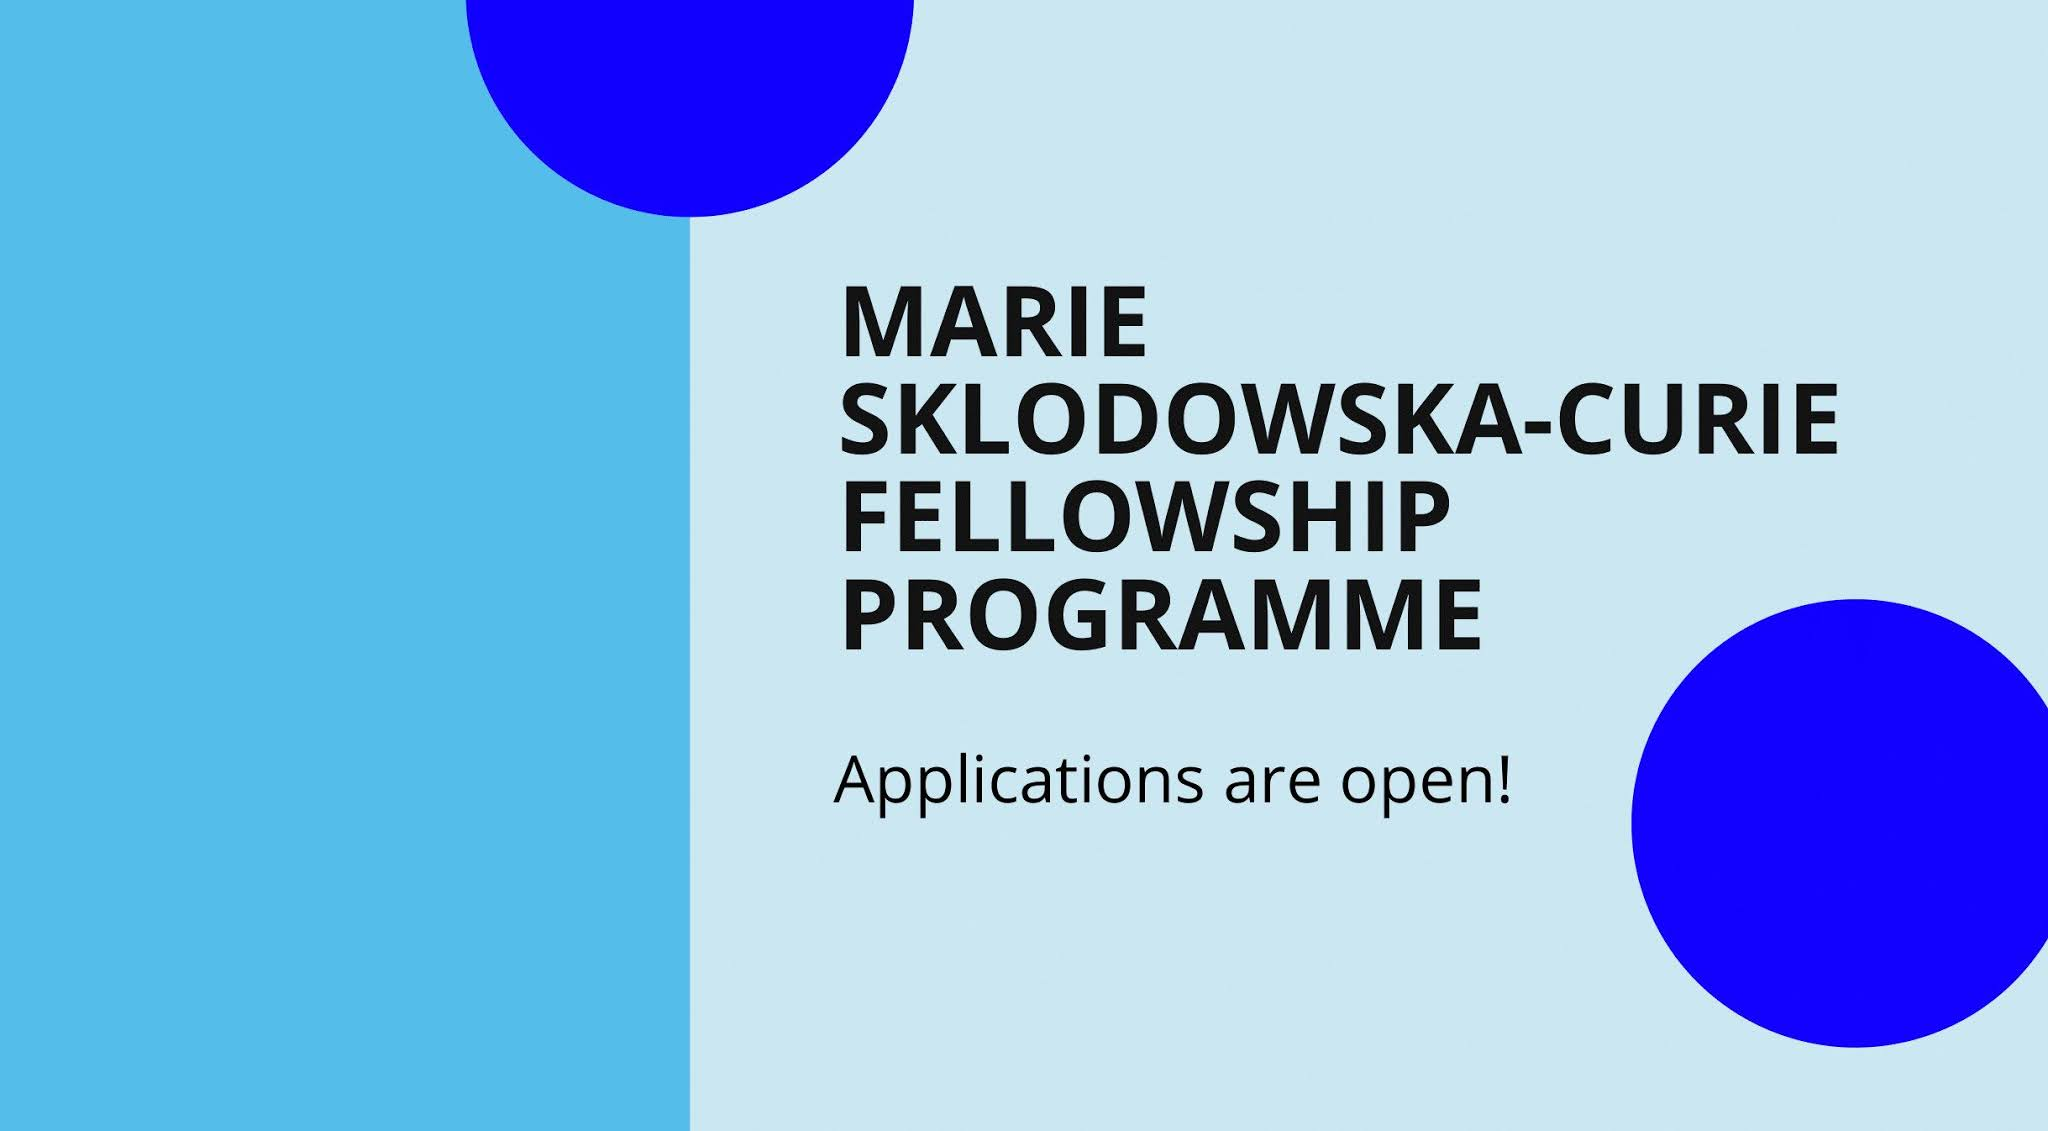 IAEA Marie Sklodowska-Curie Fellowship Programme 2021